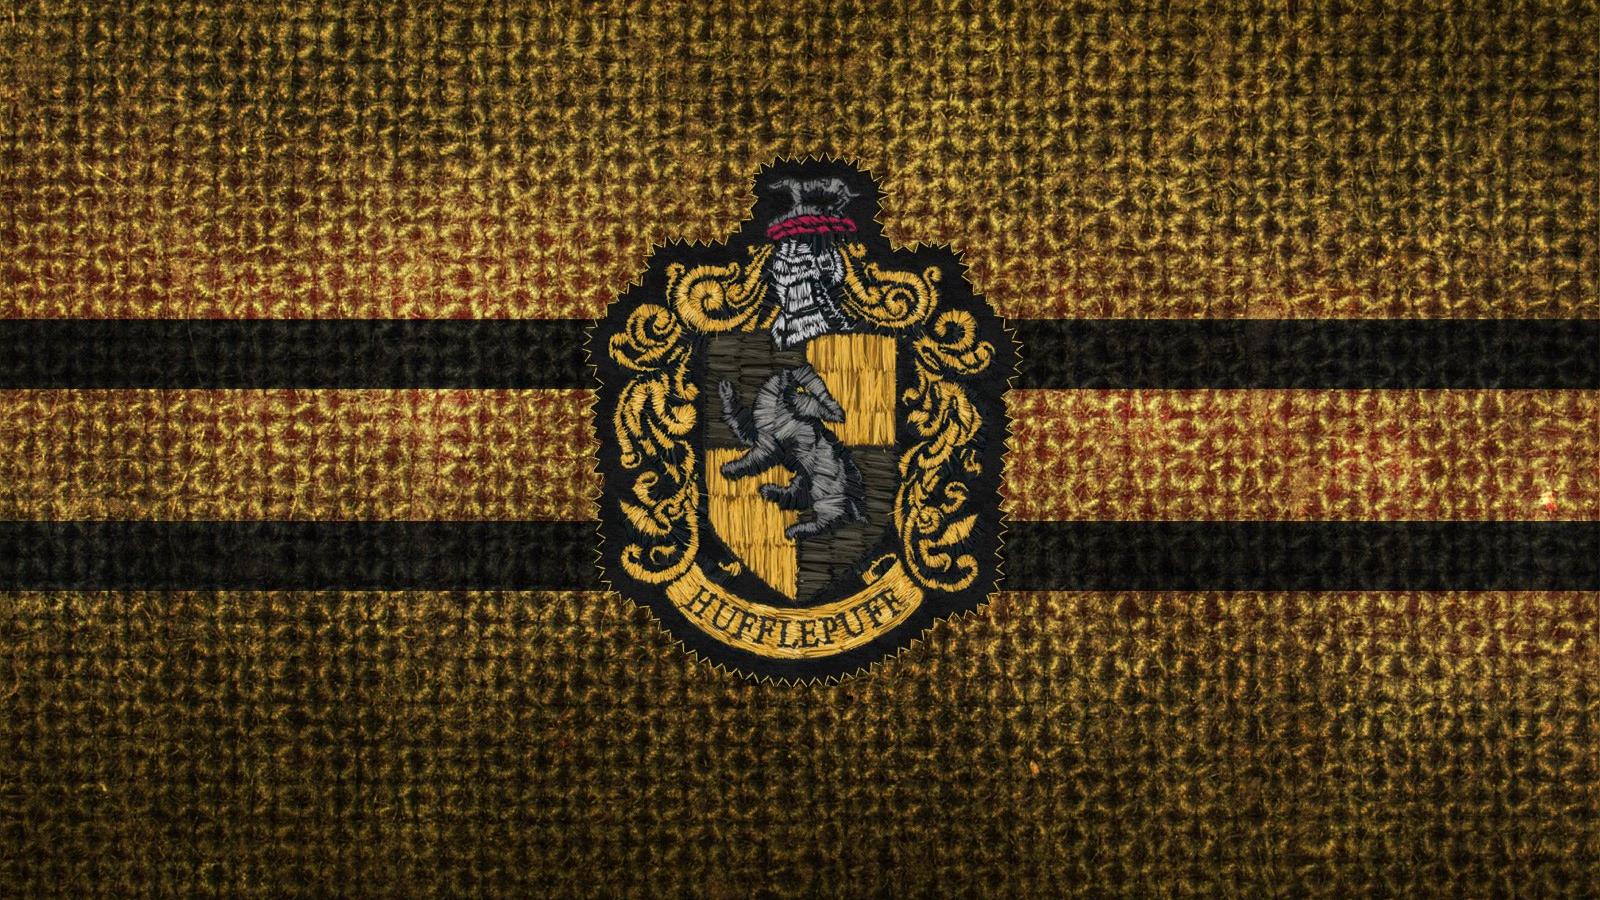 Free Download Harry Potter Hogwarts Hufflepuff Crest Best